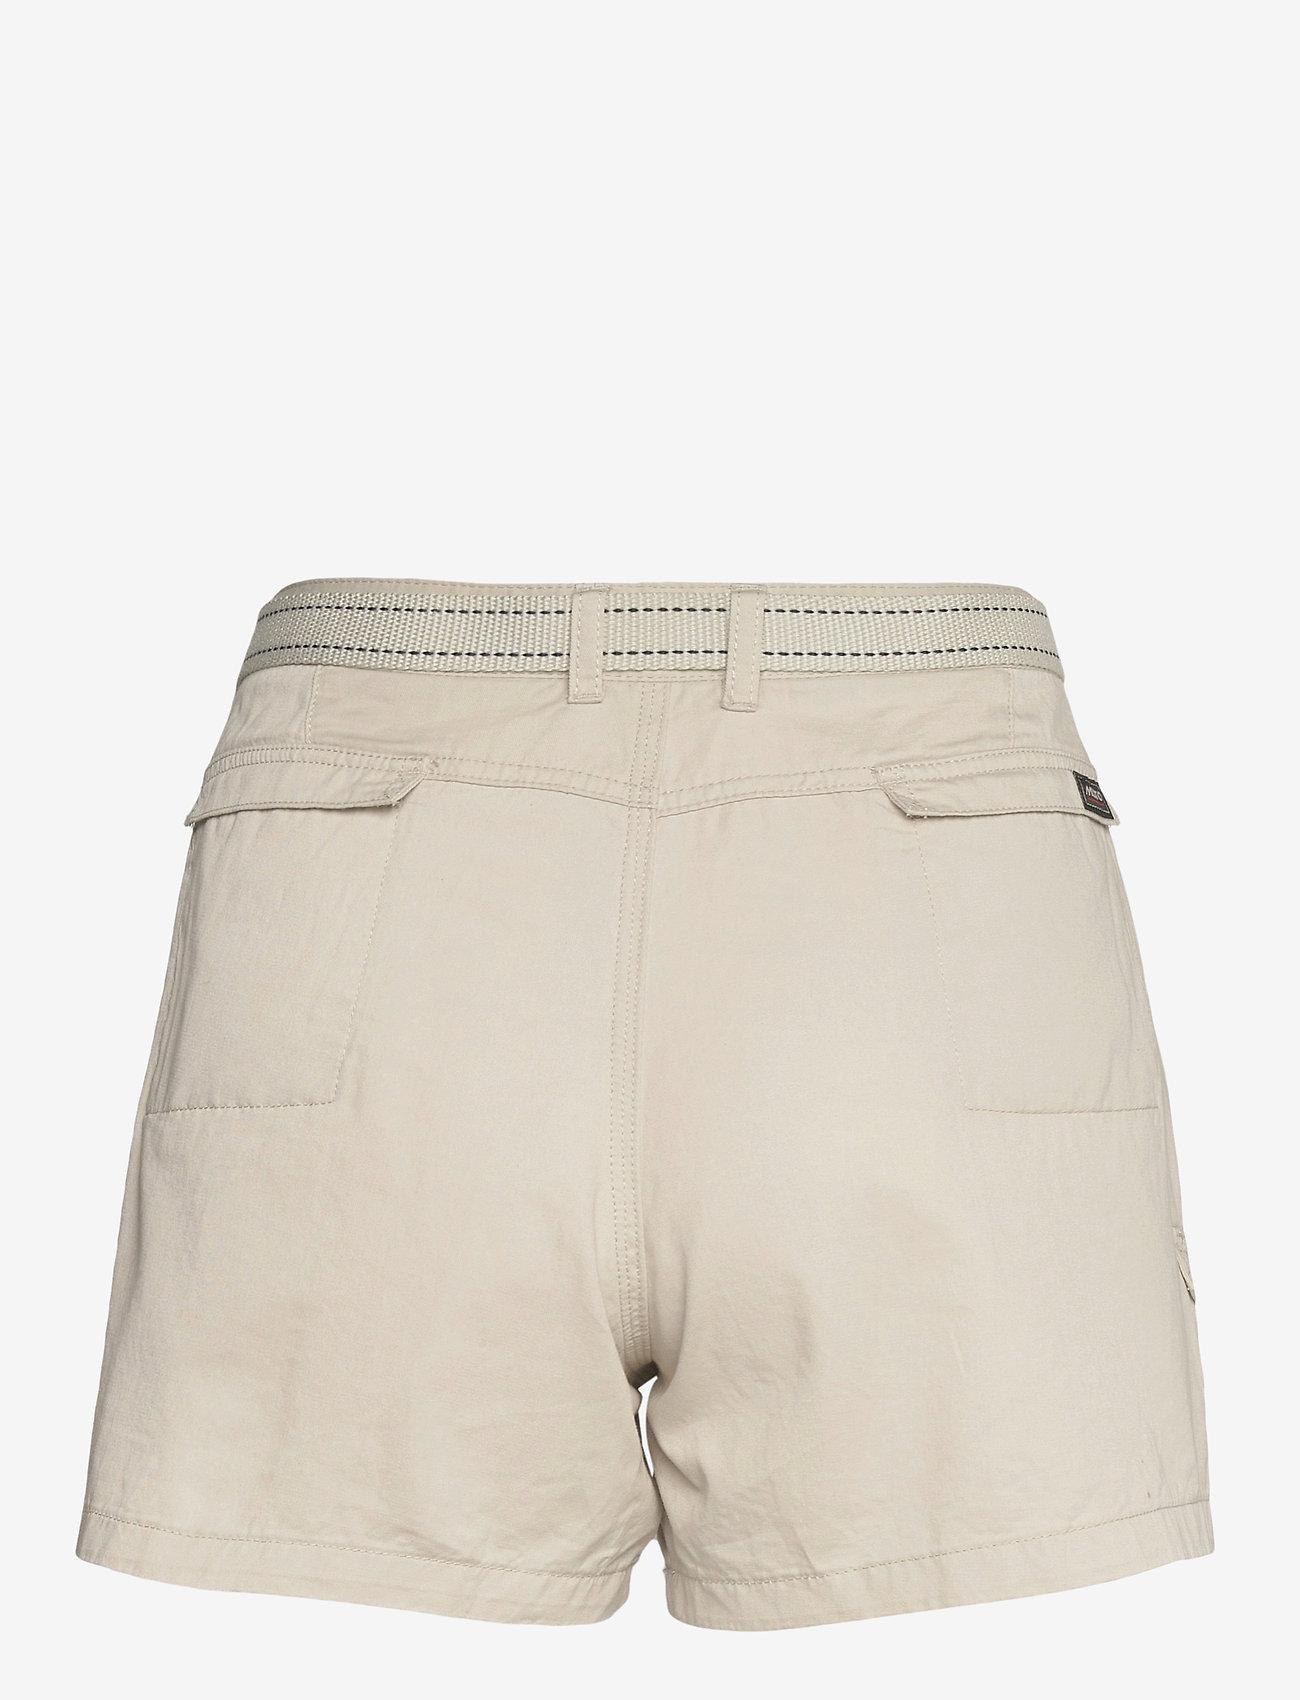 Musto - TACK COTTON SHORT FW - chino shorts - white sand - 1